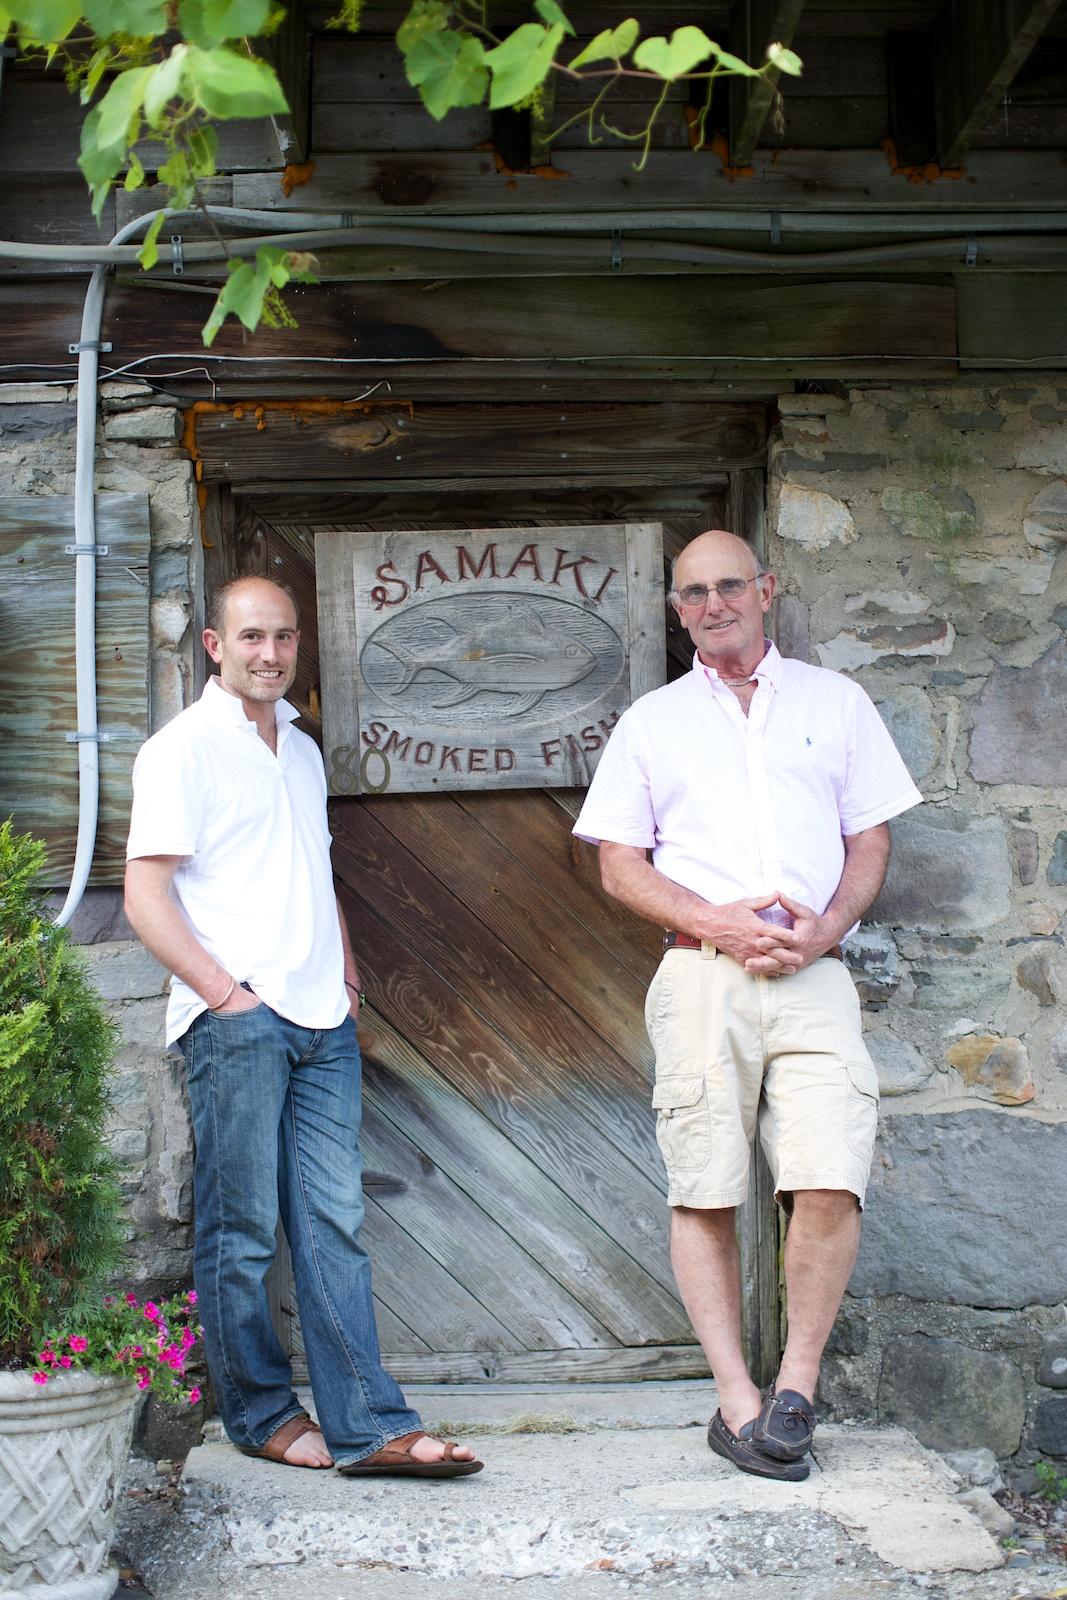 The first Samaki Inc. smokehouse in America.